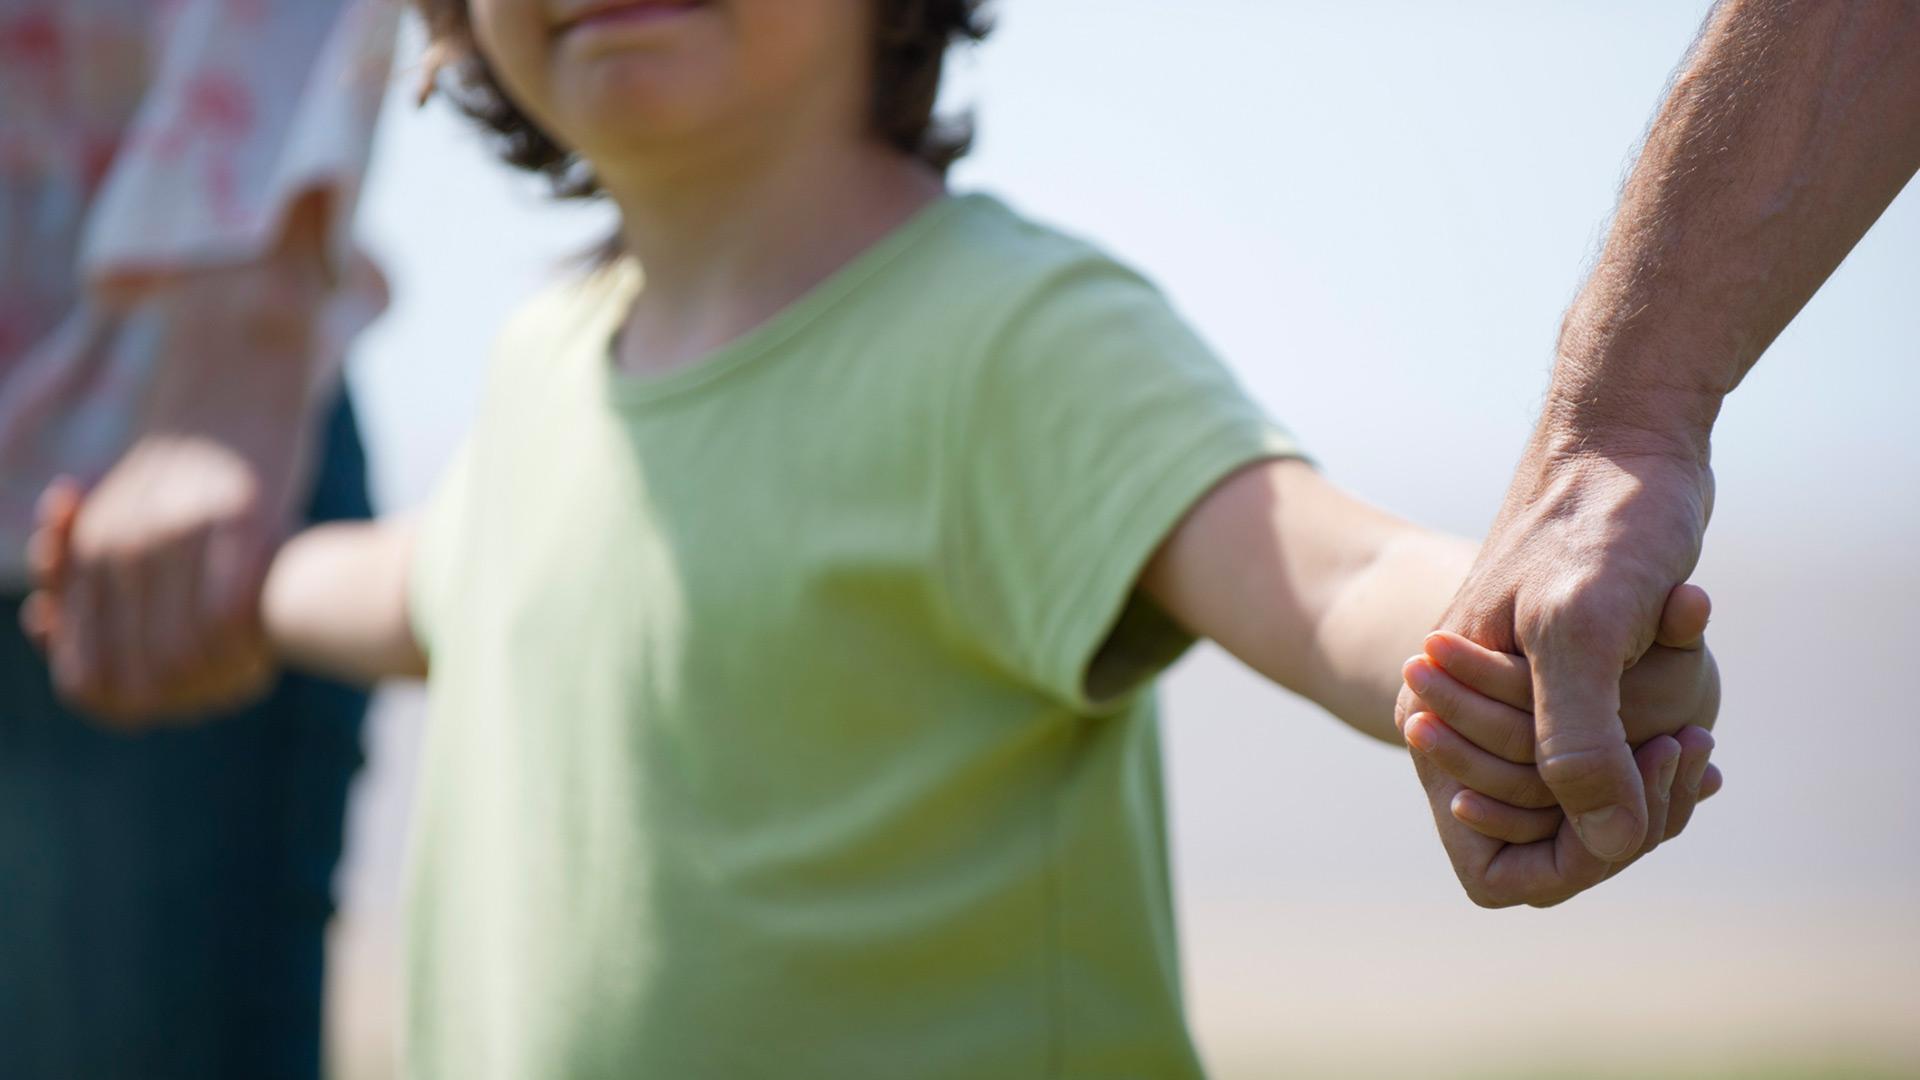 Parentalidade Consciente: 5 formas de resolver problemas